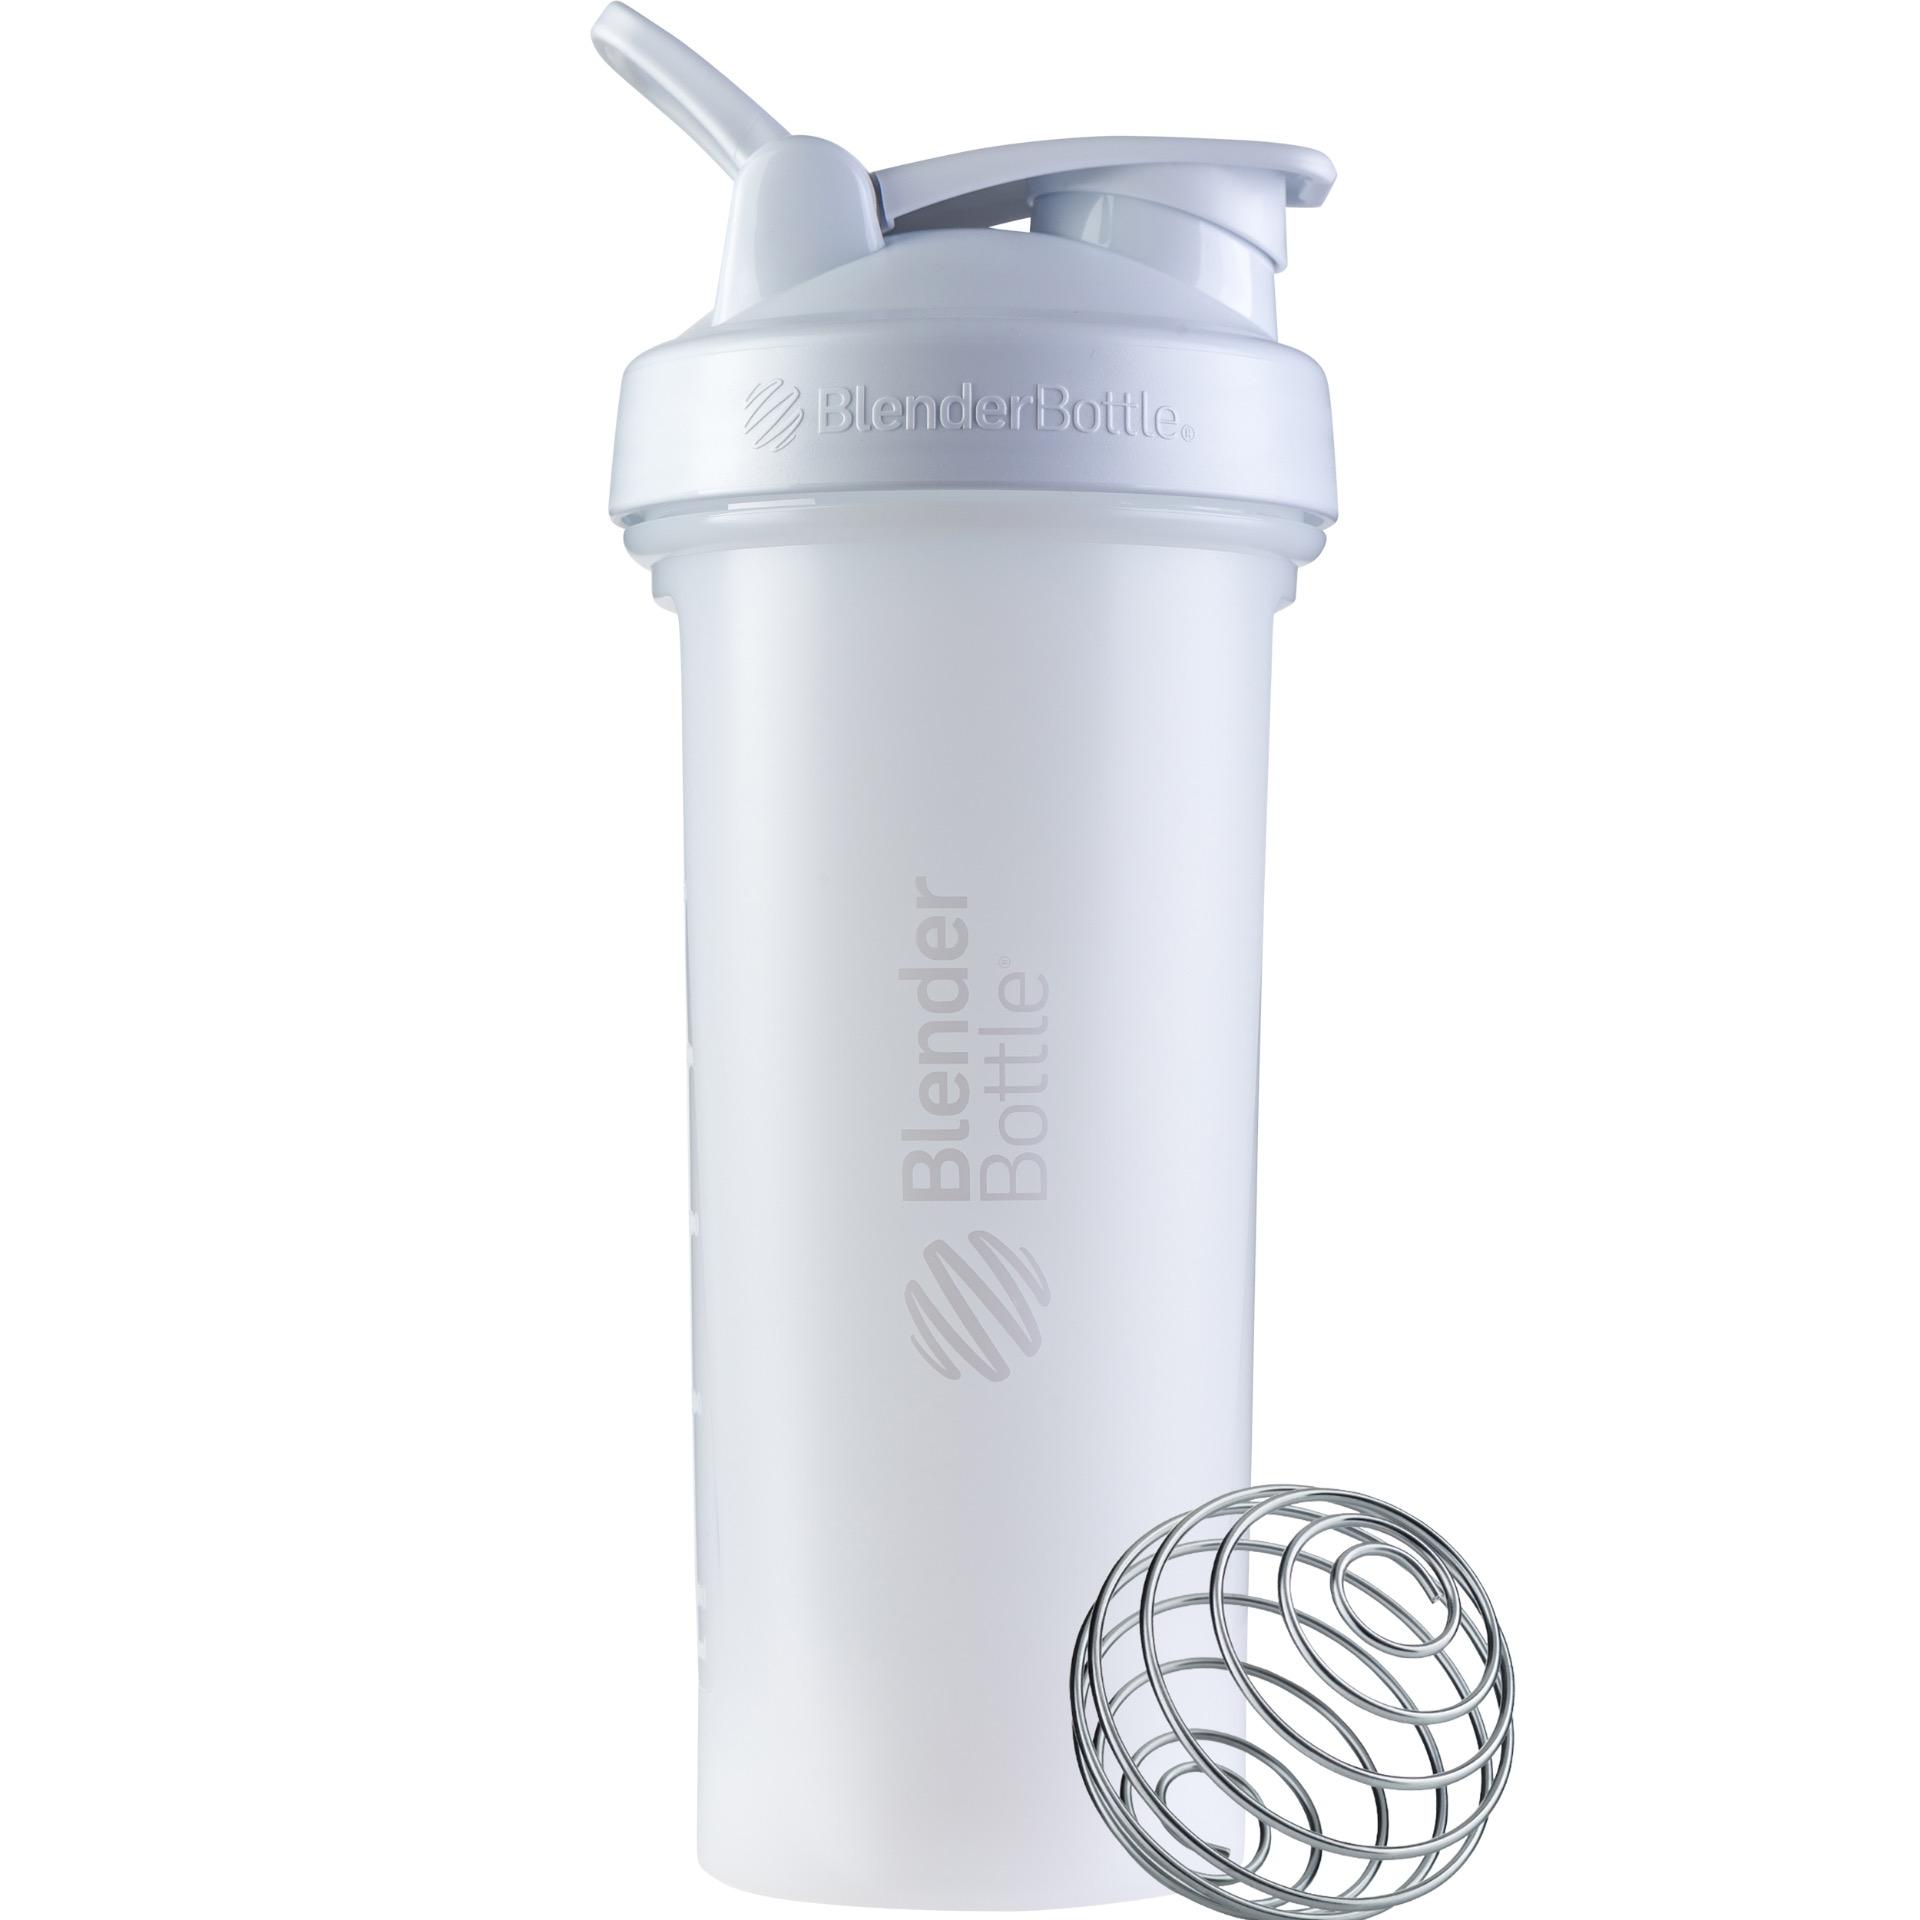 [Blender Bottle] 第2代Classic搖搖杯(830ml/28oz)-雪白